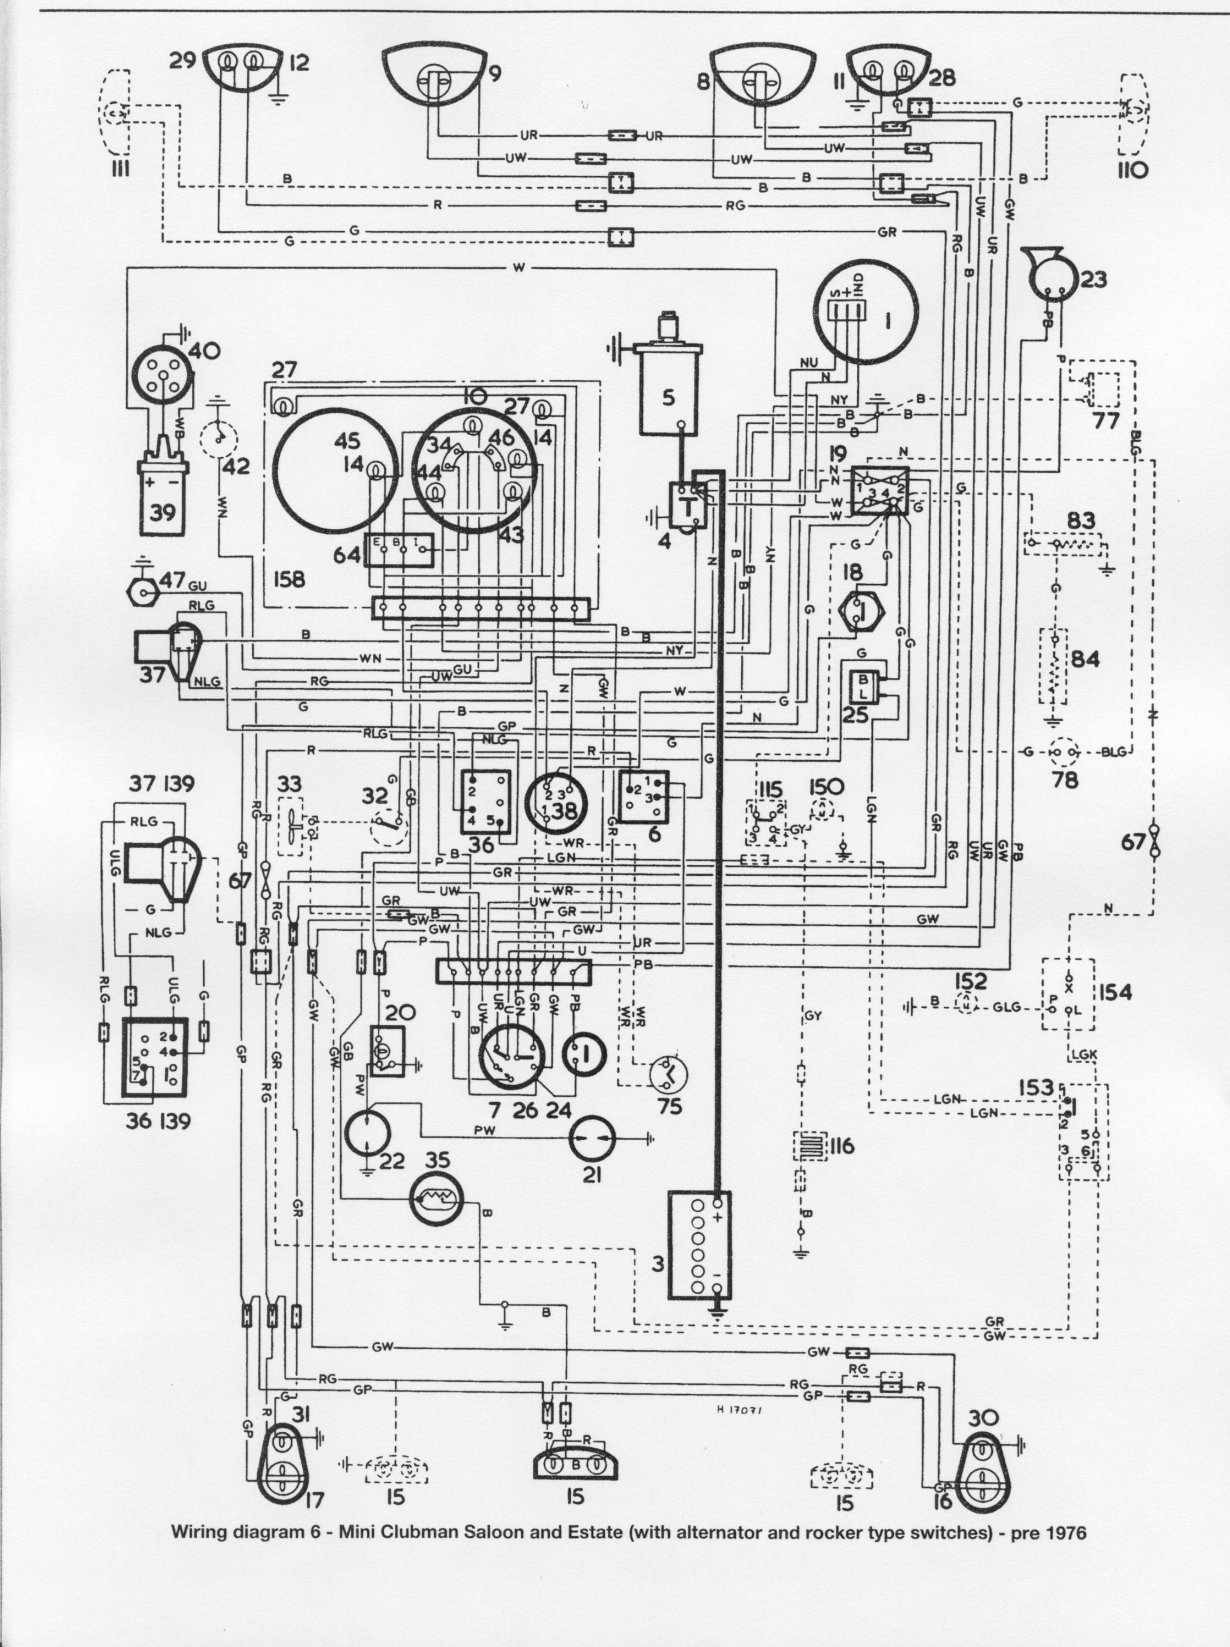 wiring diagram of 1976 mini clubman saloon and estate?t=1494187160 bmw r1200rt radio manual pdf